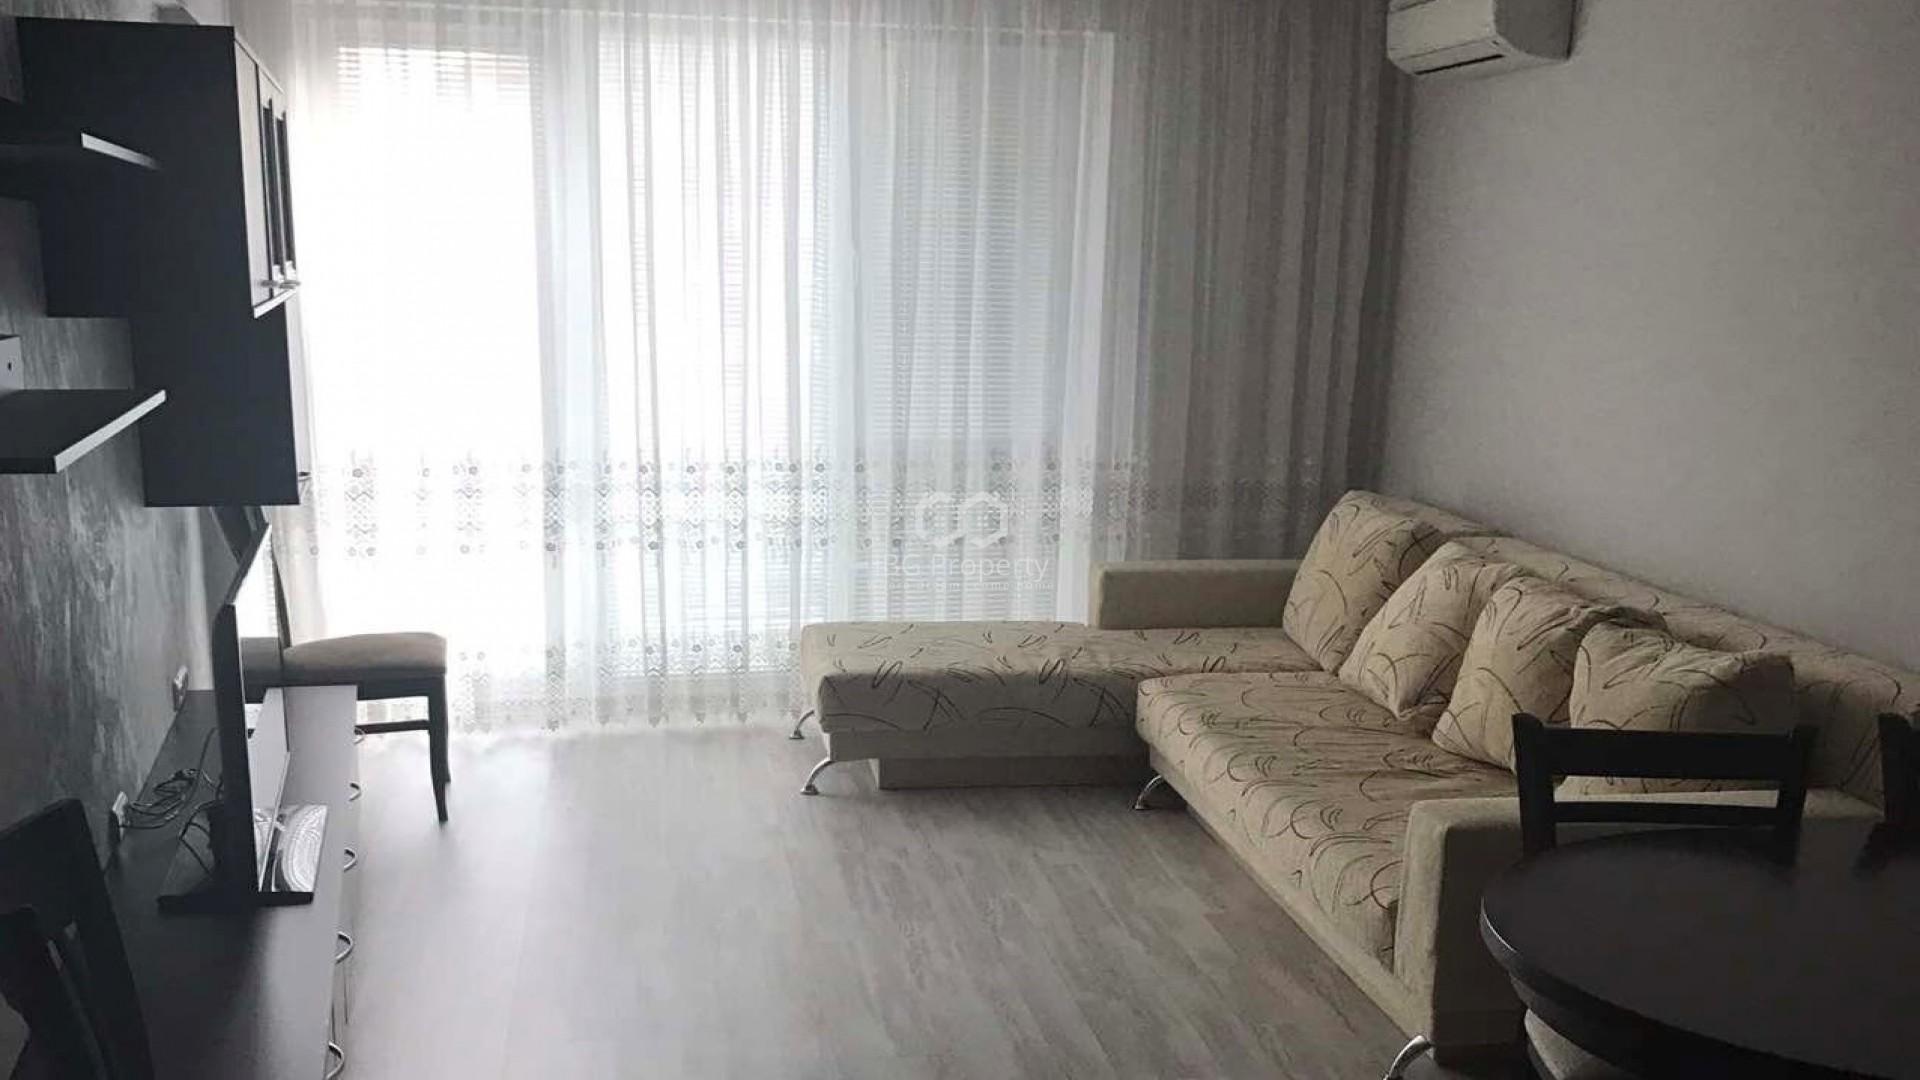 Tристаен апартамент Център Бургас  95 m2